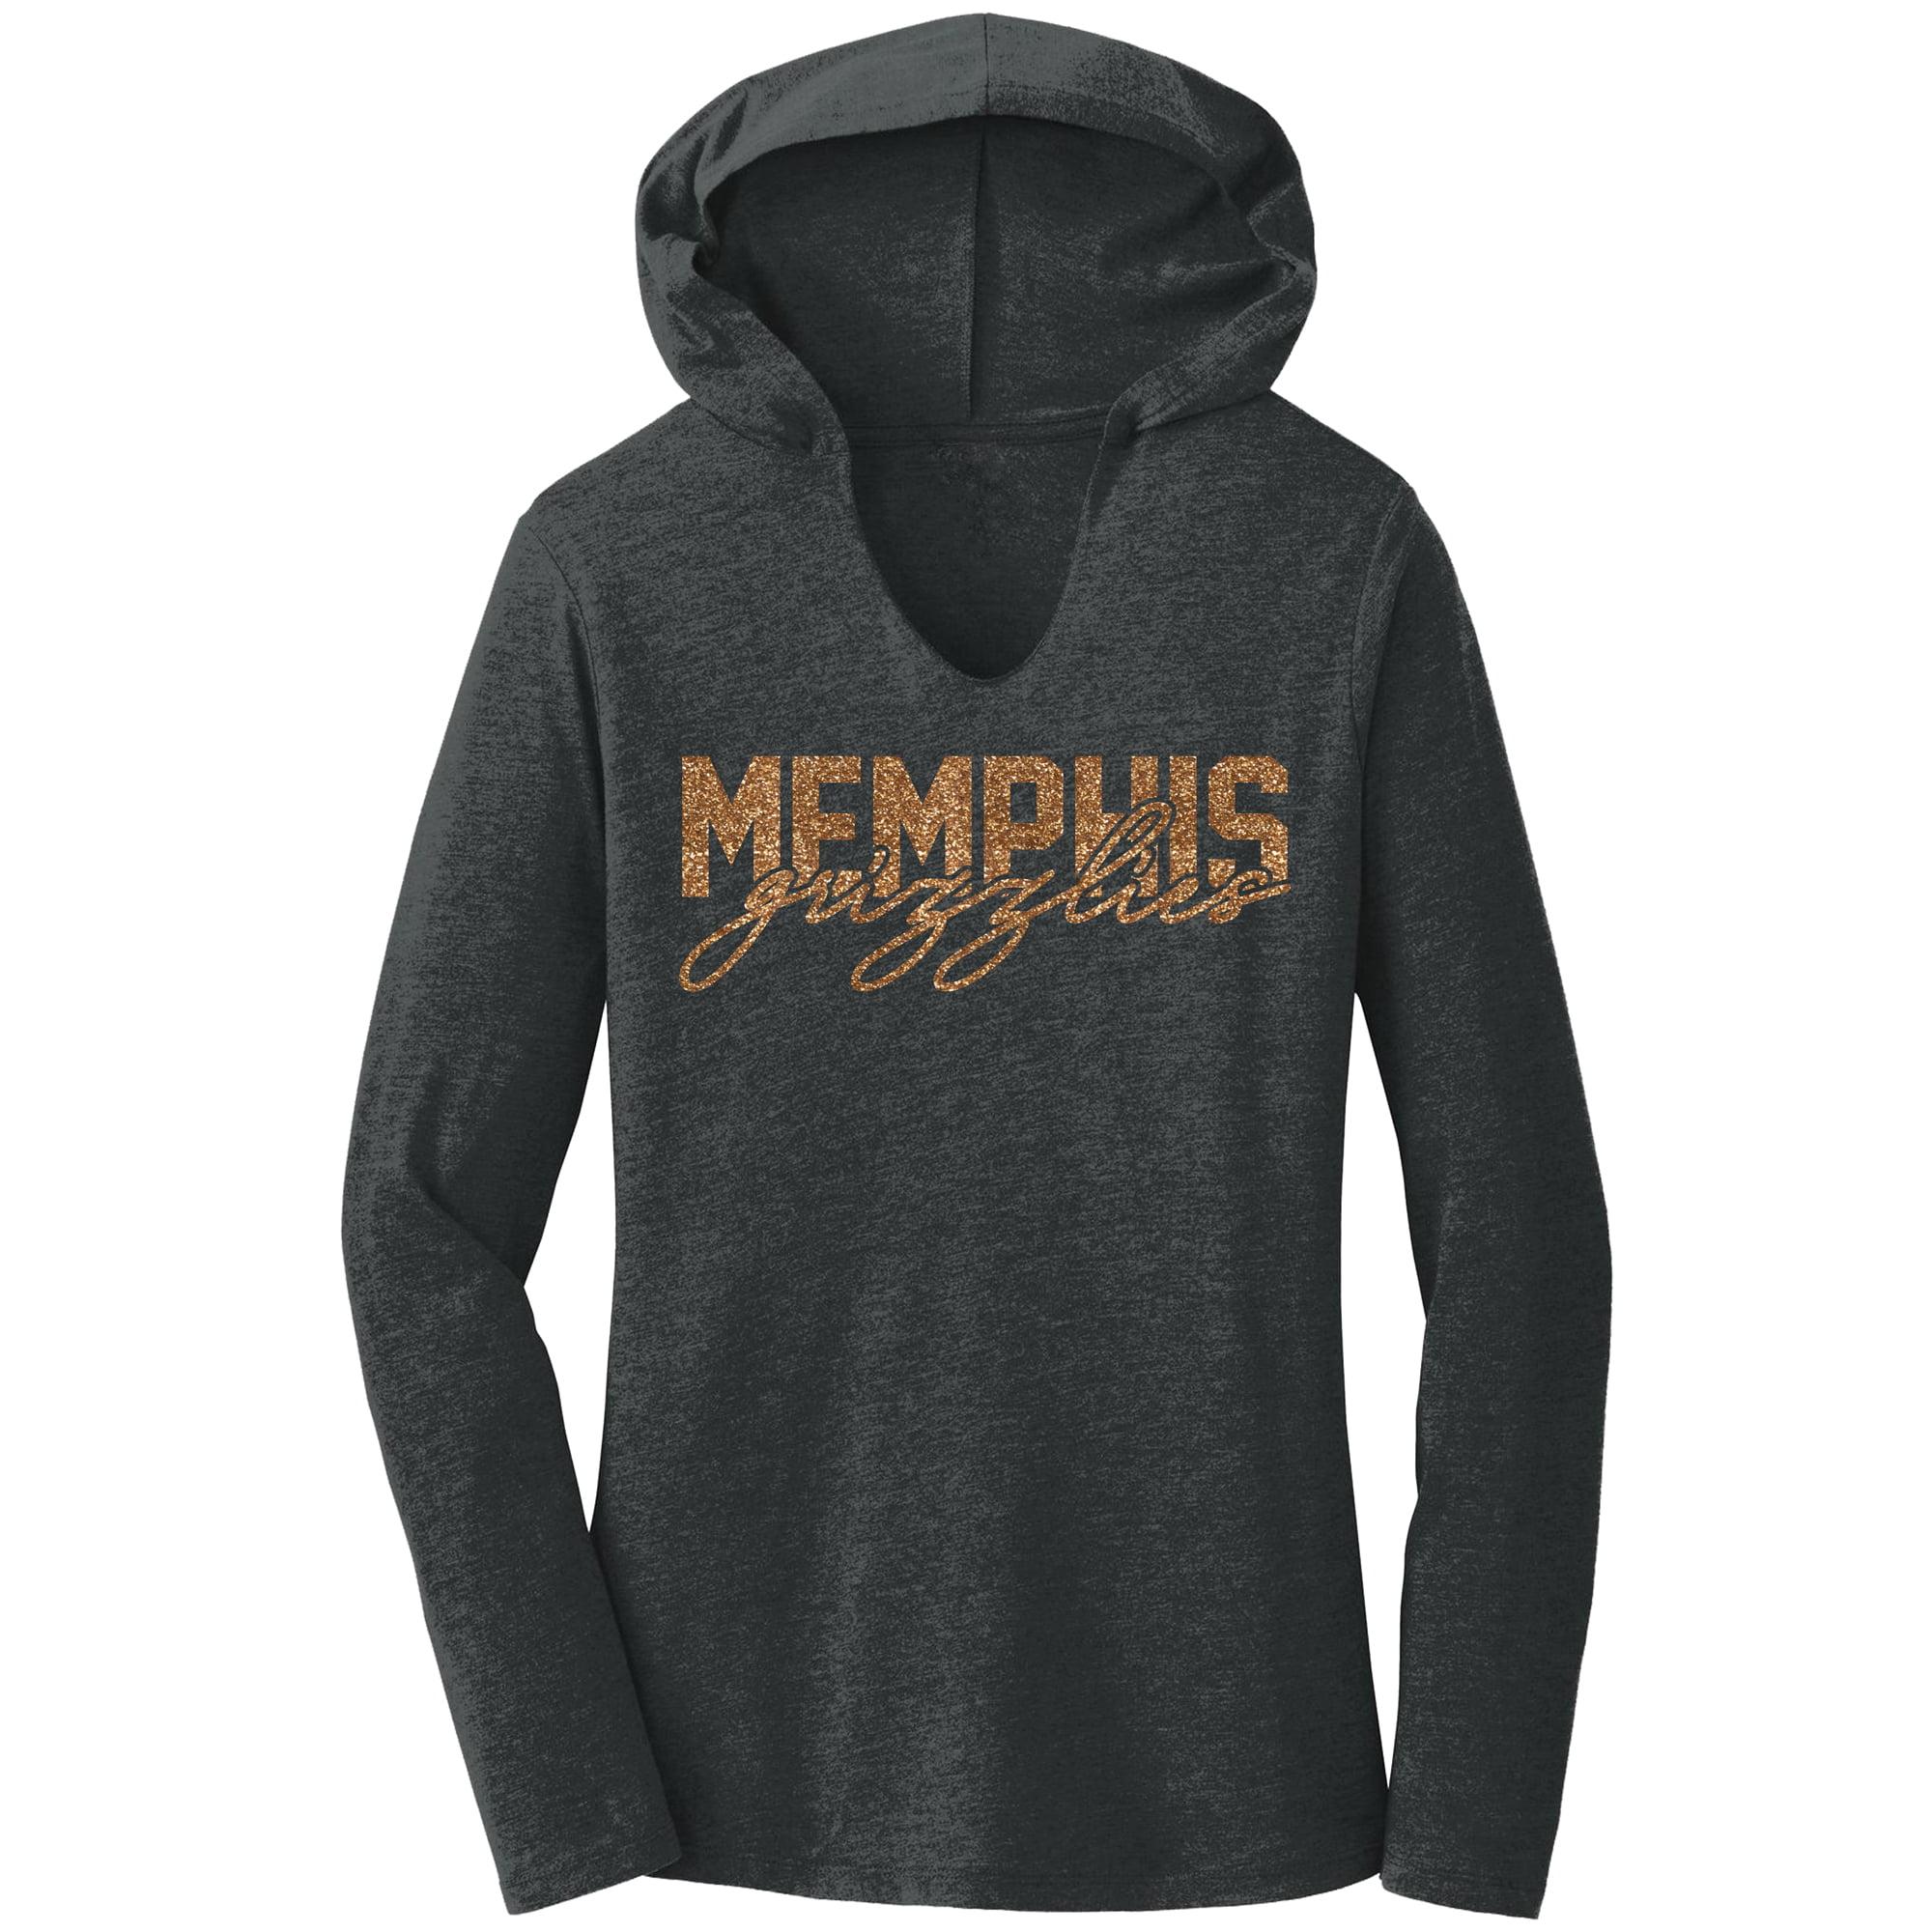 Memphis Grizzlies Women's Bling Hoodie - Charcoal